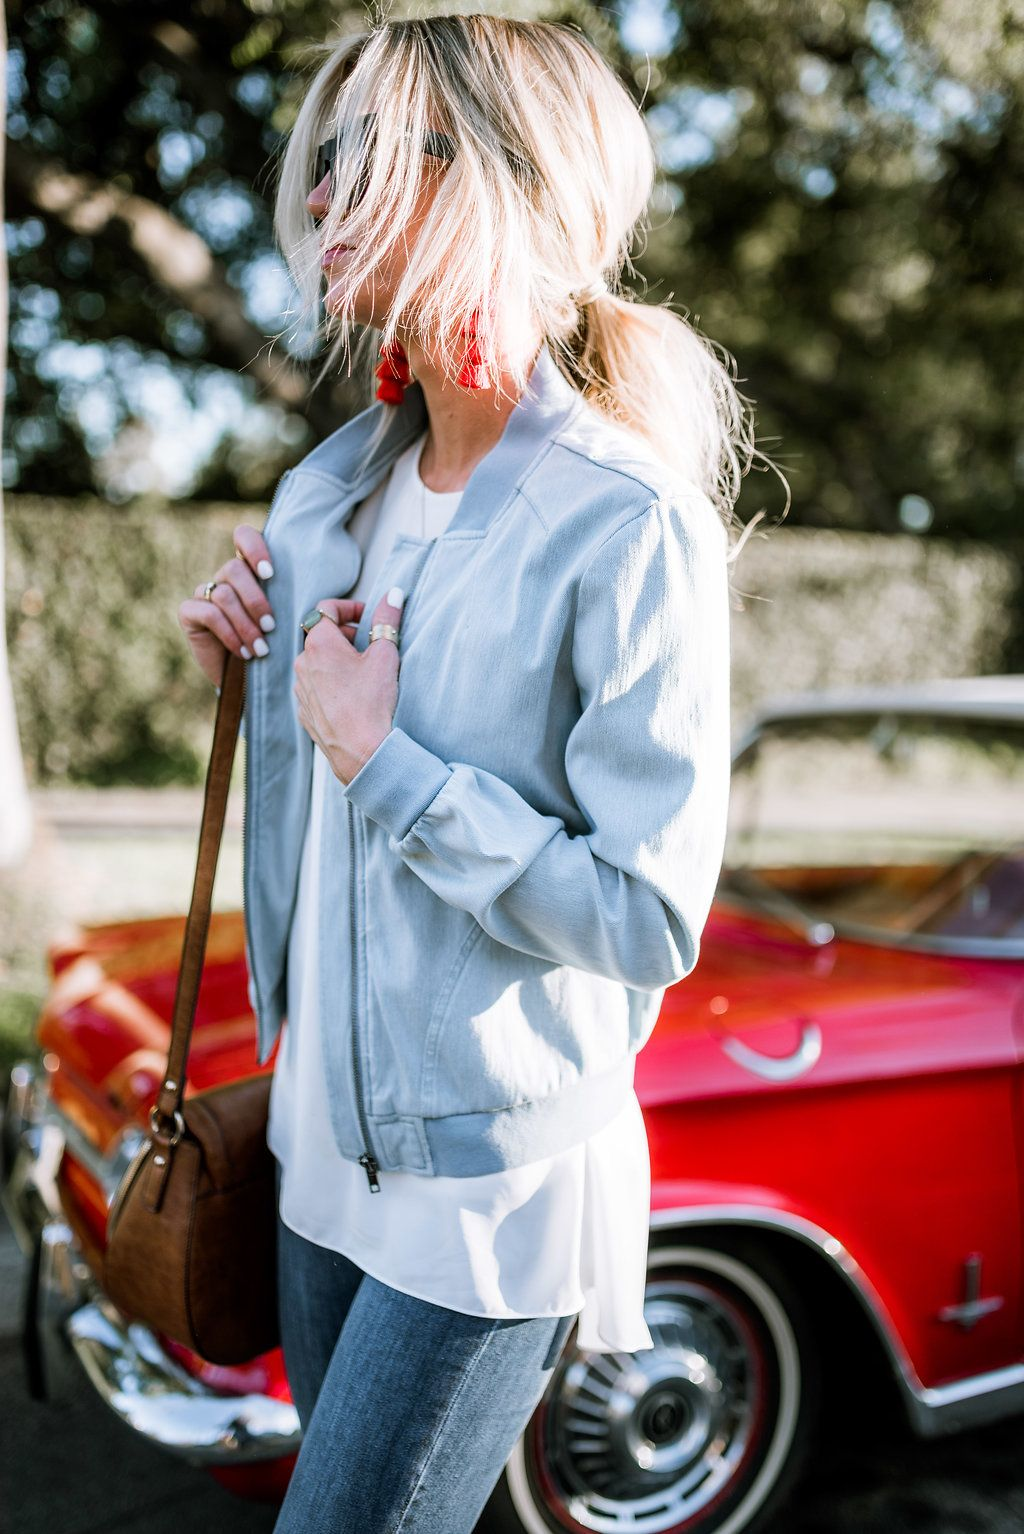 Silk Lonsleeve blouses by lorika-borika on Polyvore